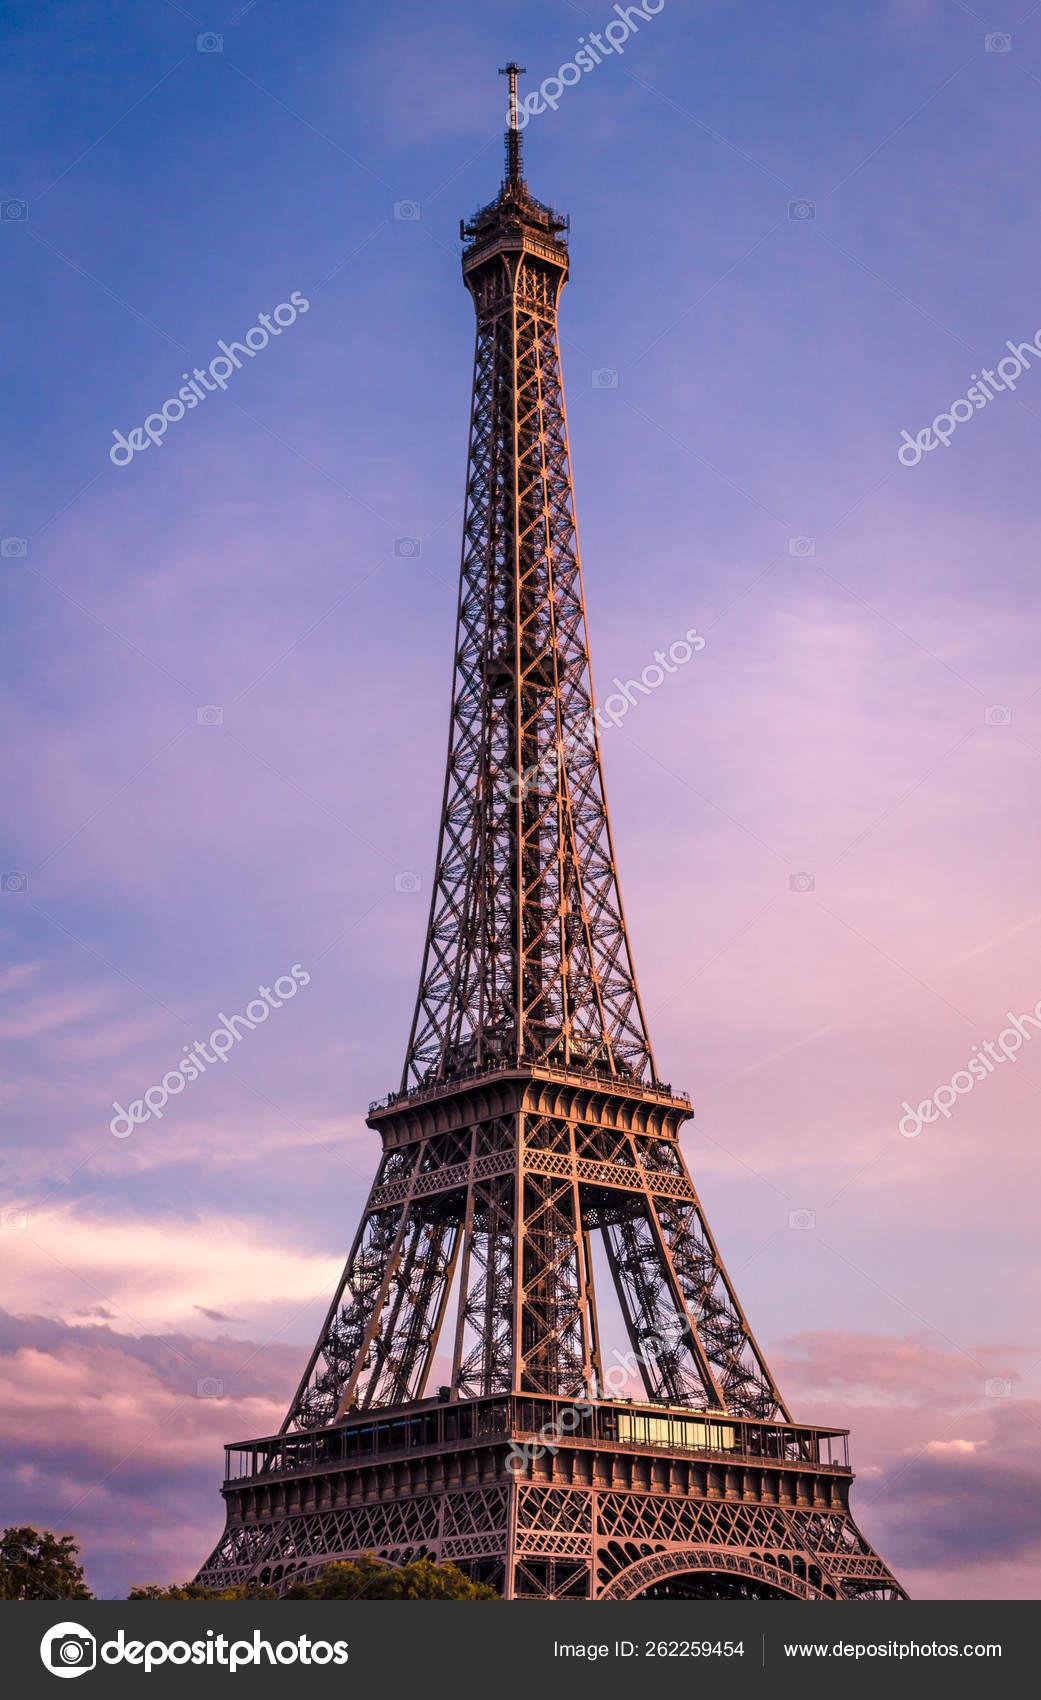 Eiffel Tower Blue Purple Sunset Sky Stock Photo C Yayimages 262259454